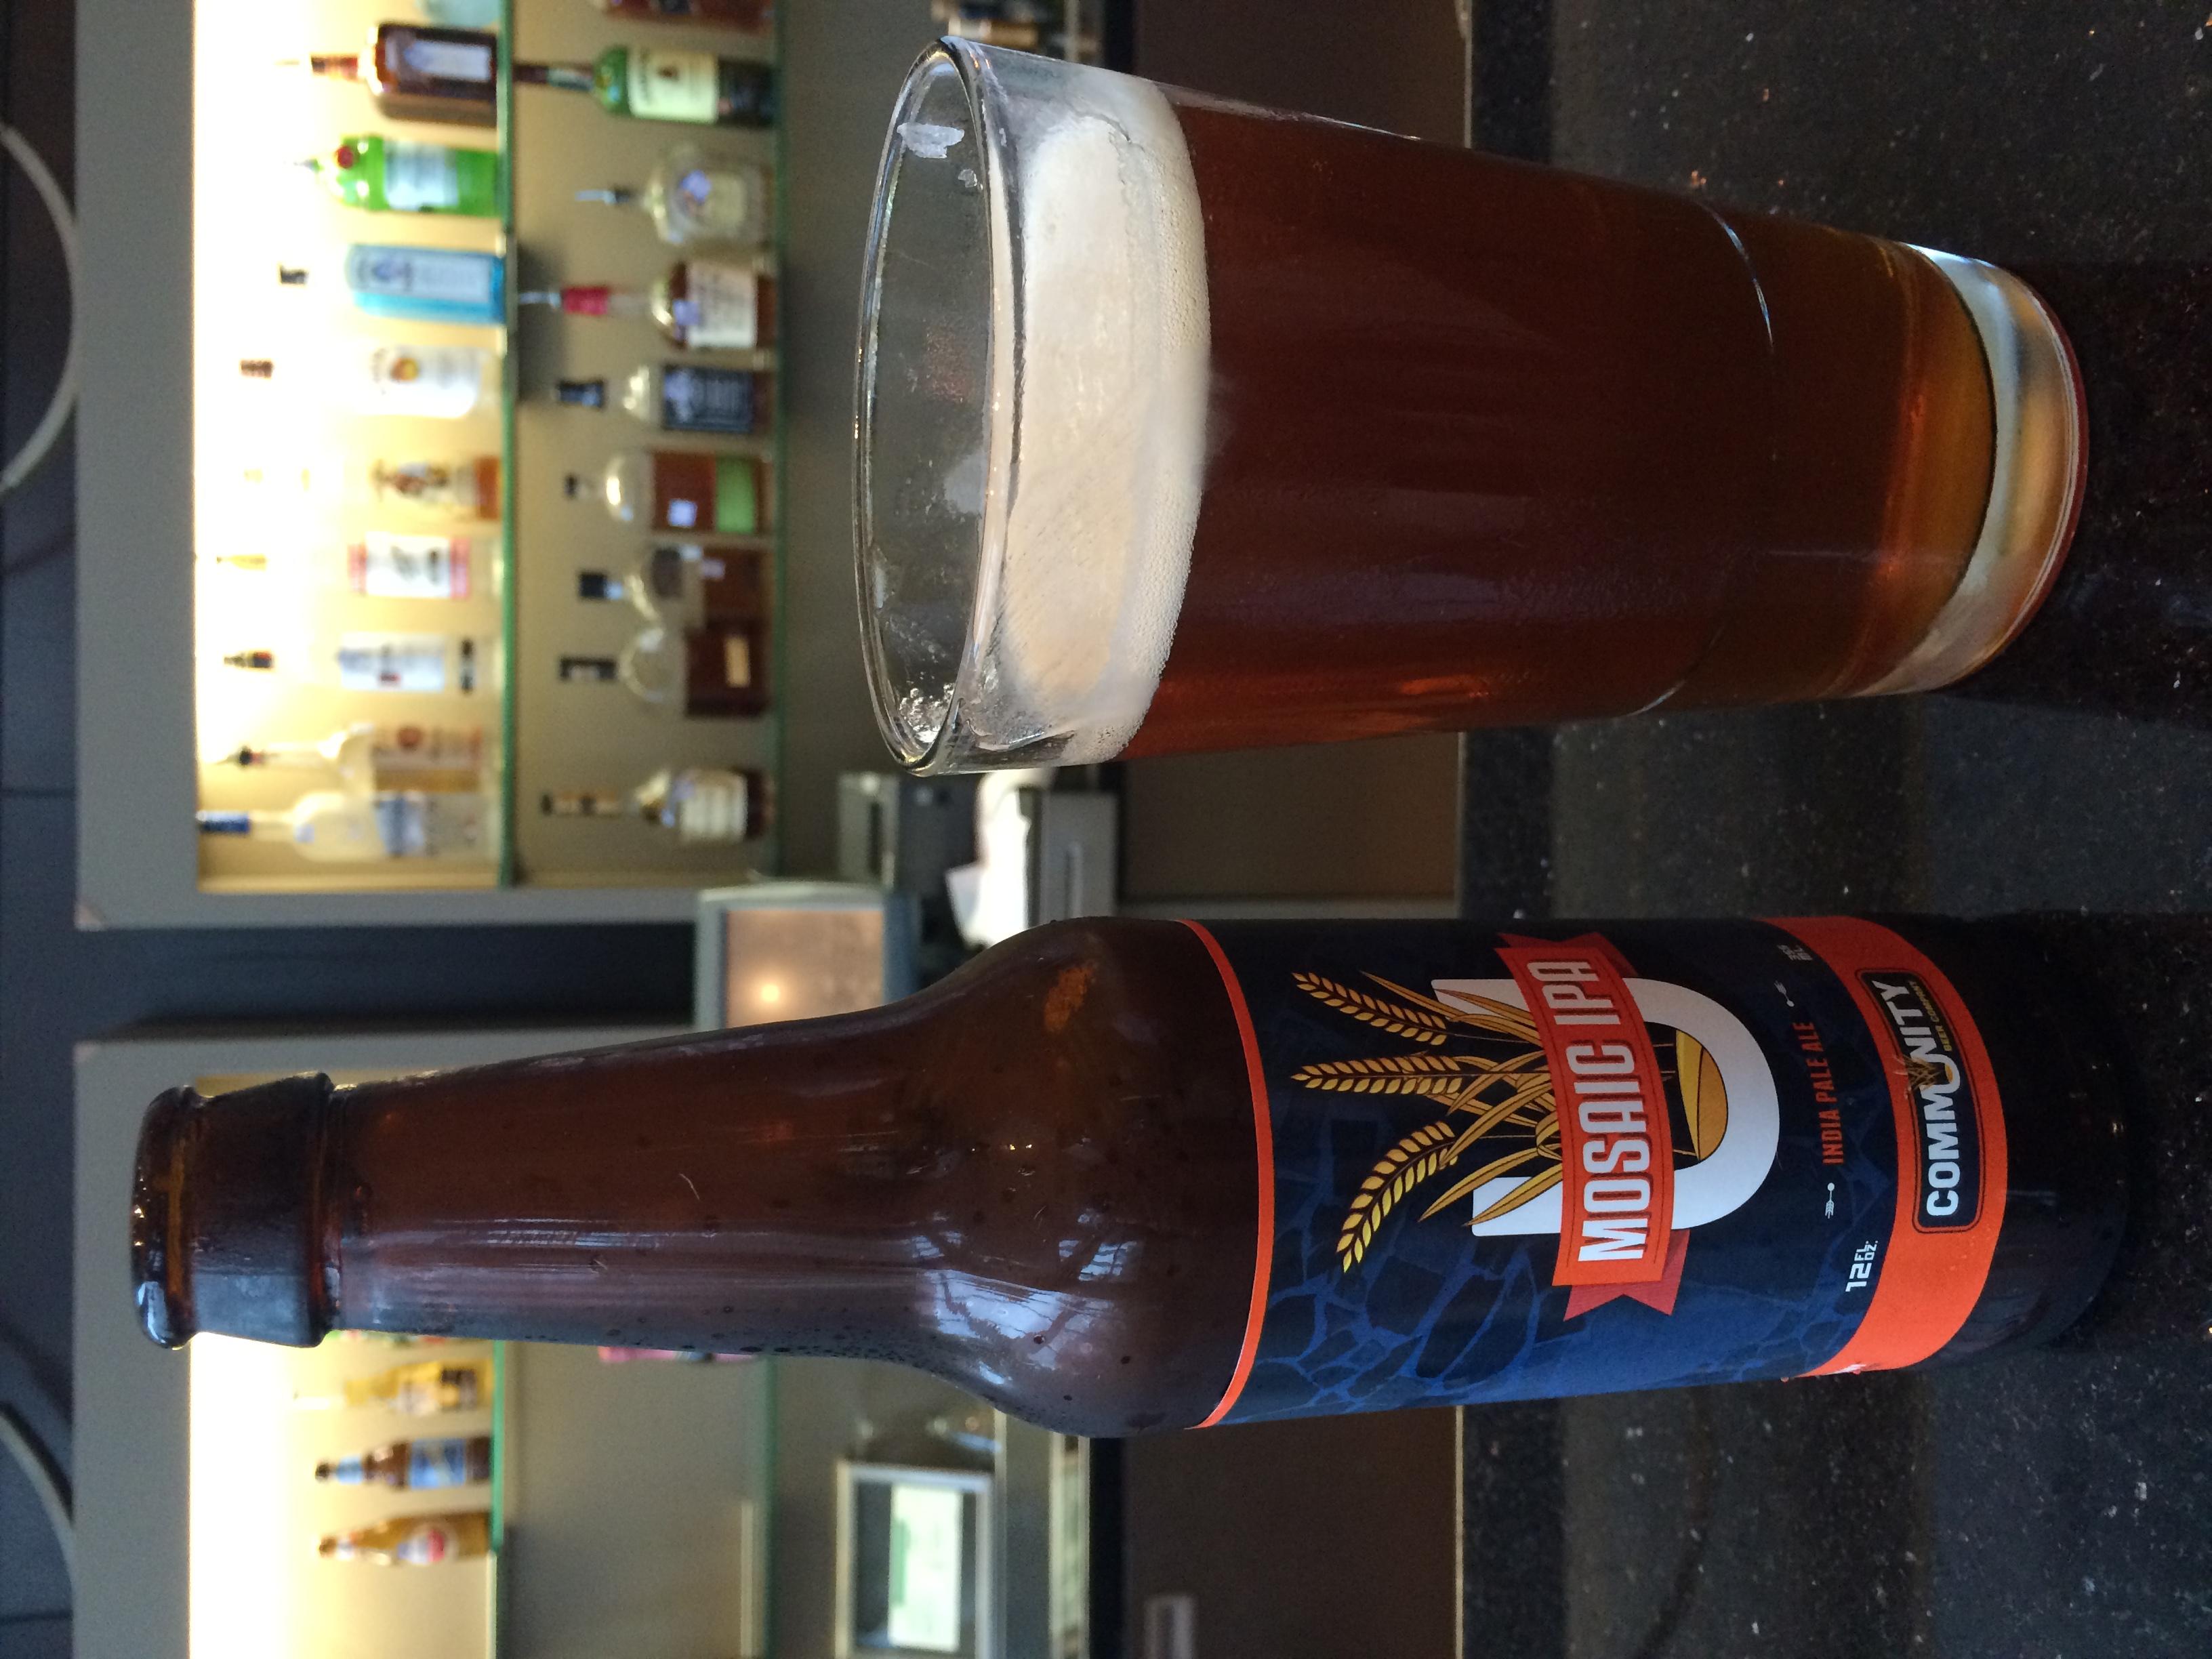 Community Beer Co.'s Mosaic IPA